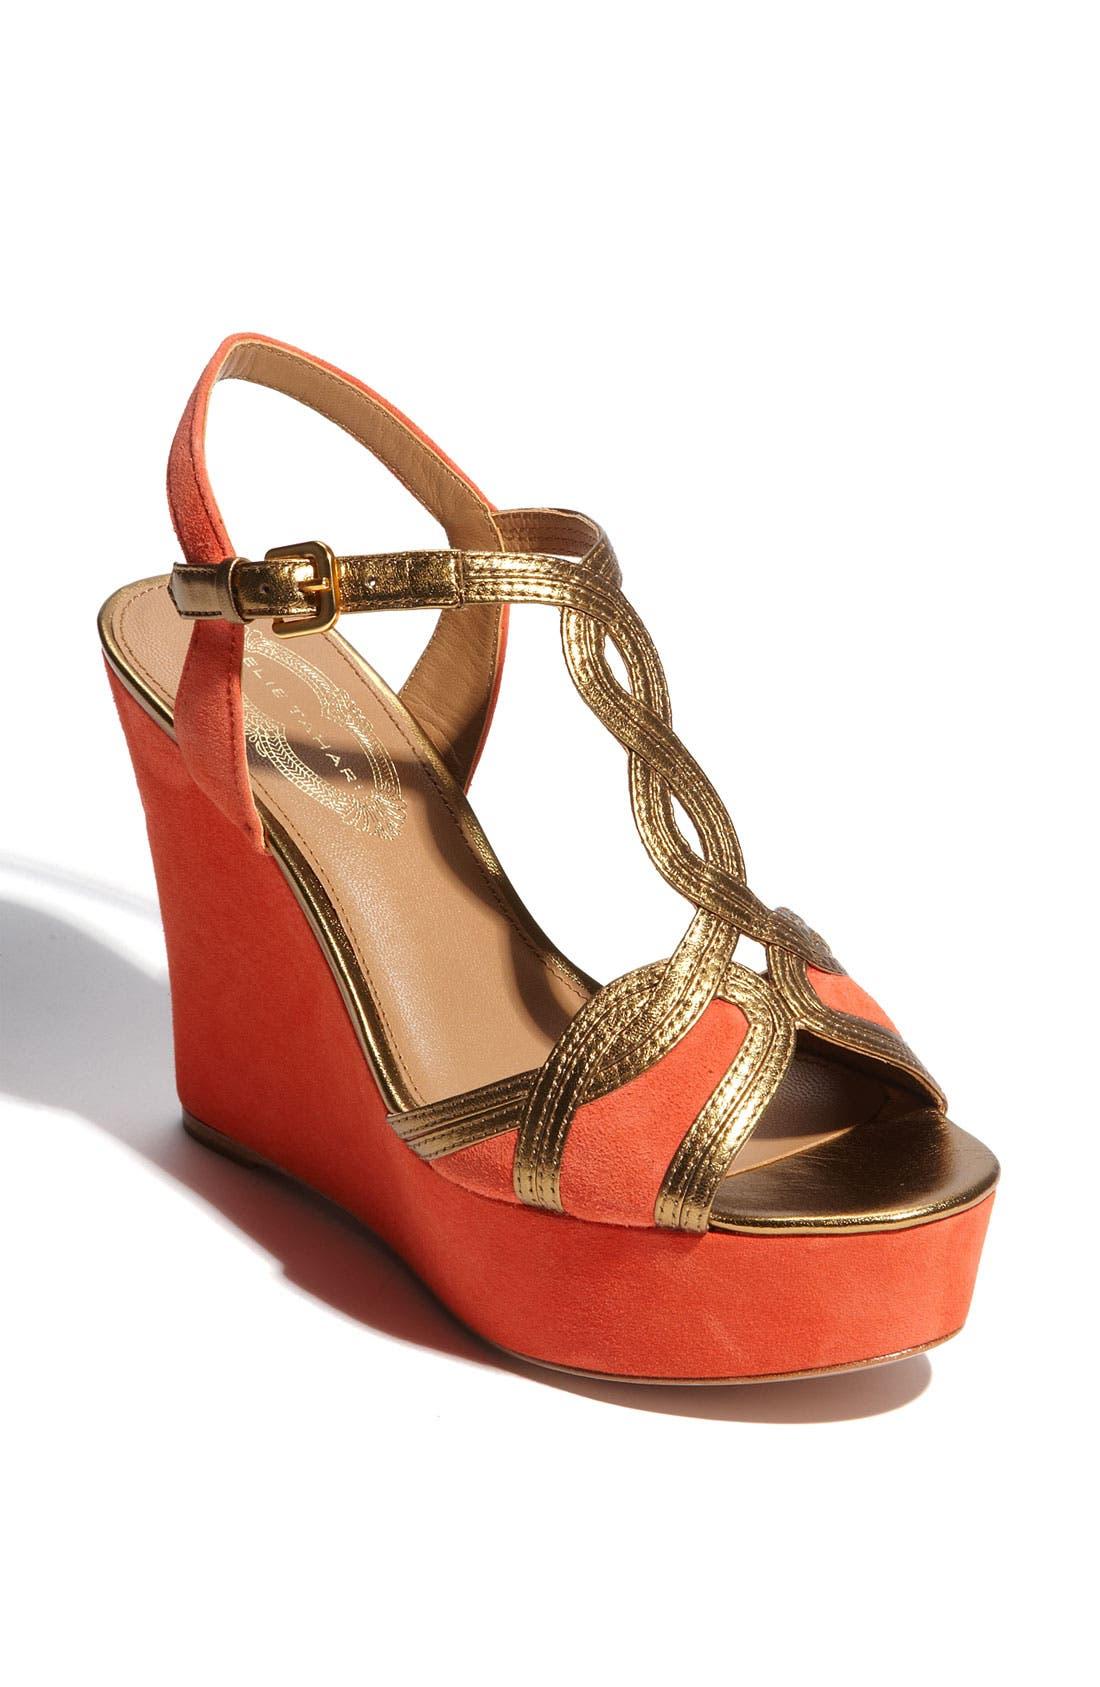 Main Image - Elie Tahari 'Lynette' Wedge Sandal